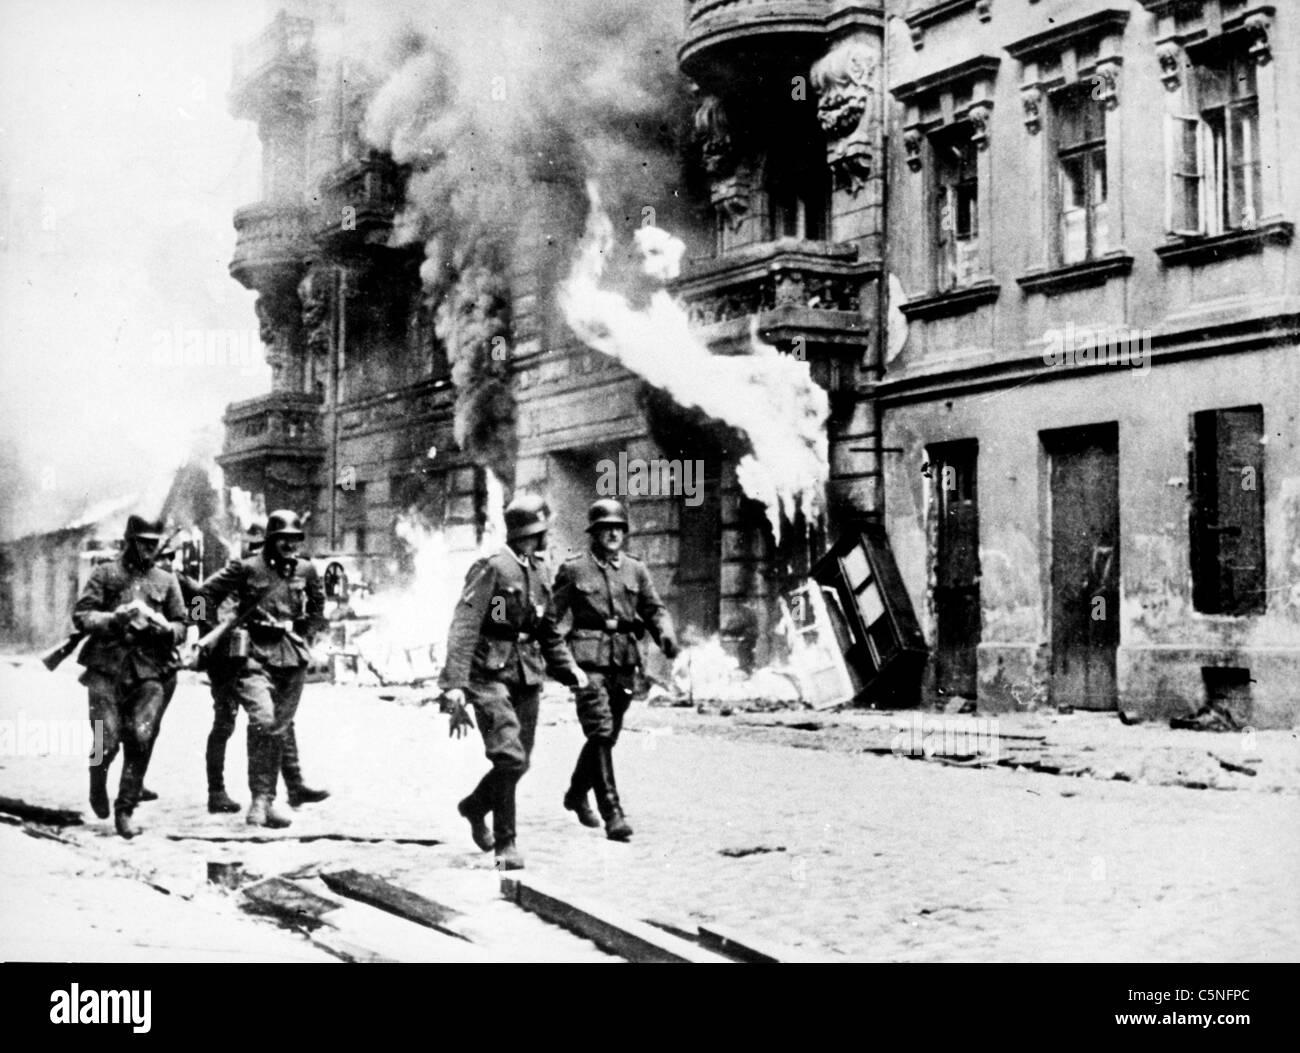 German troops during the siege of Leningrad - Stock Image